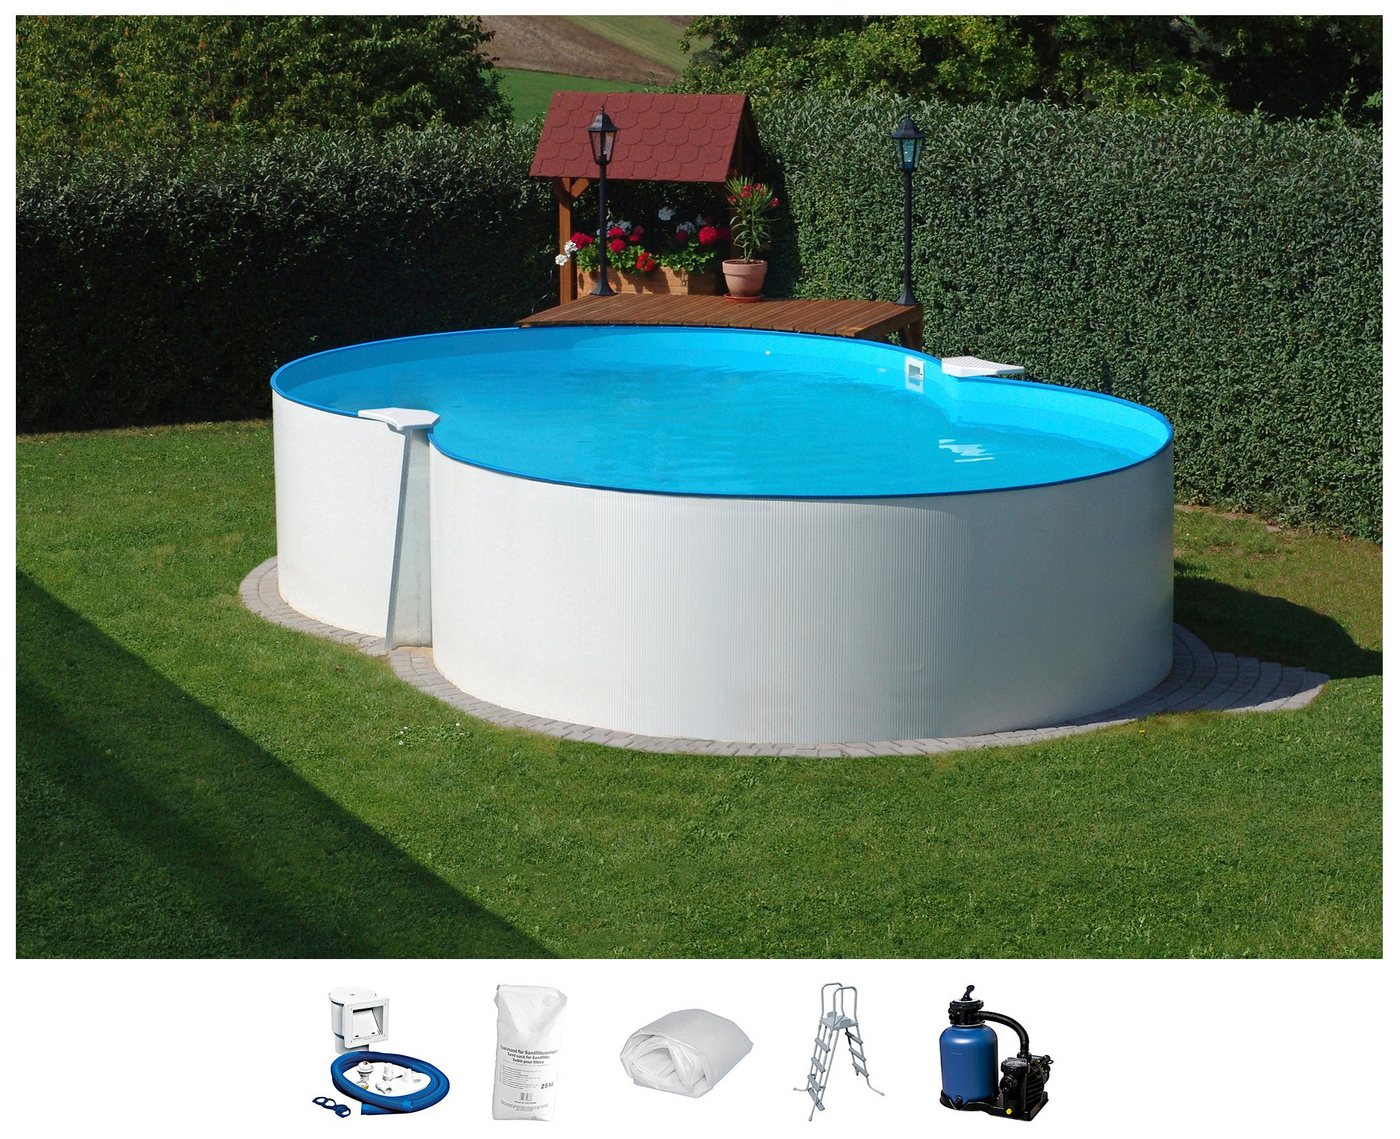 Clear Pool CLEAR POOL Komplett-Set: Achtformpool , 6-tlg. in versch. Größen